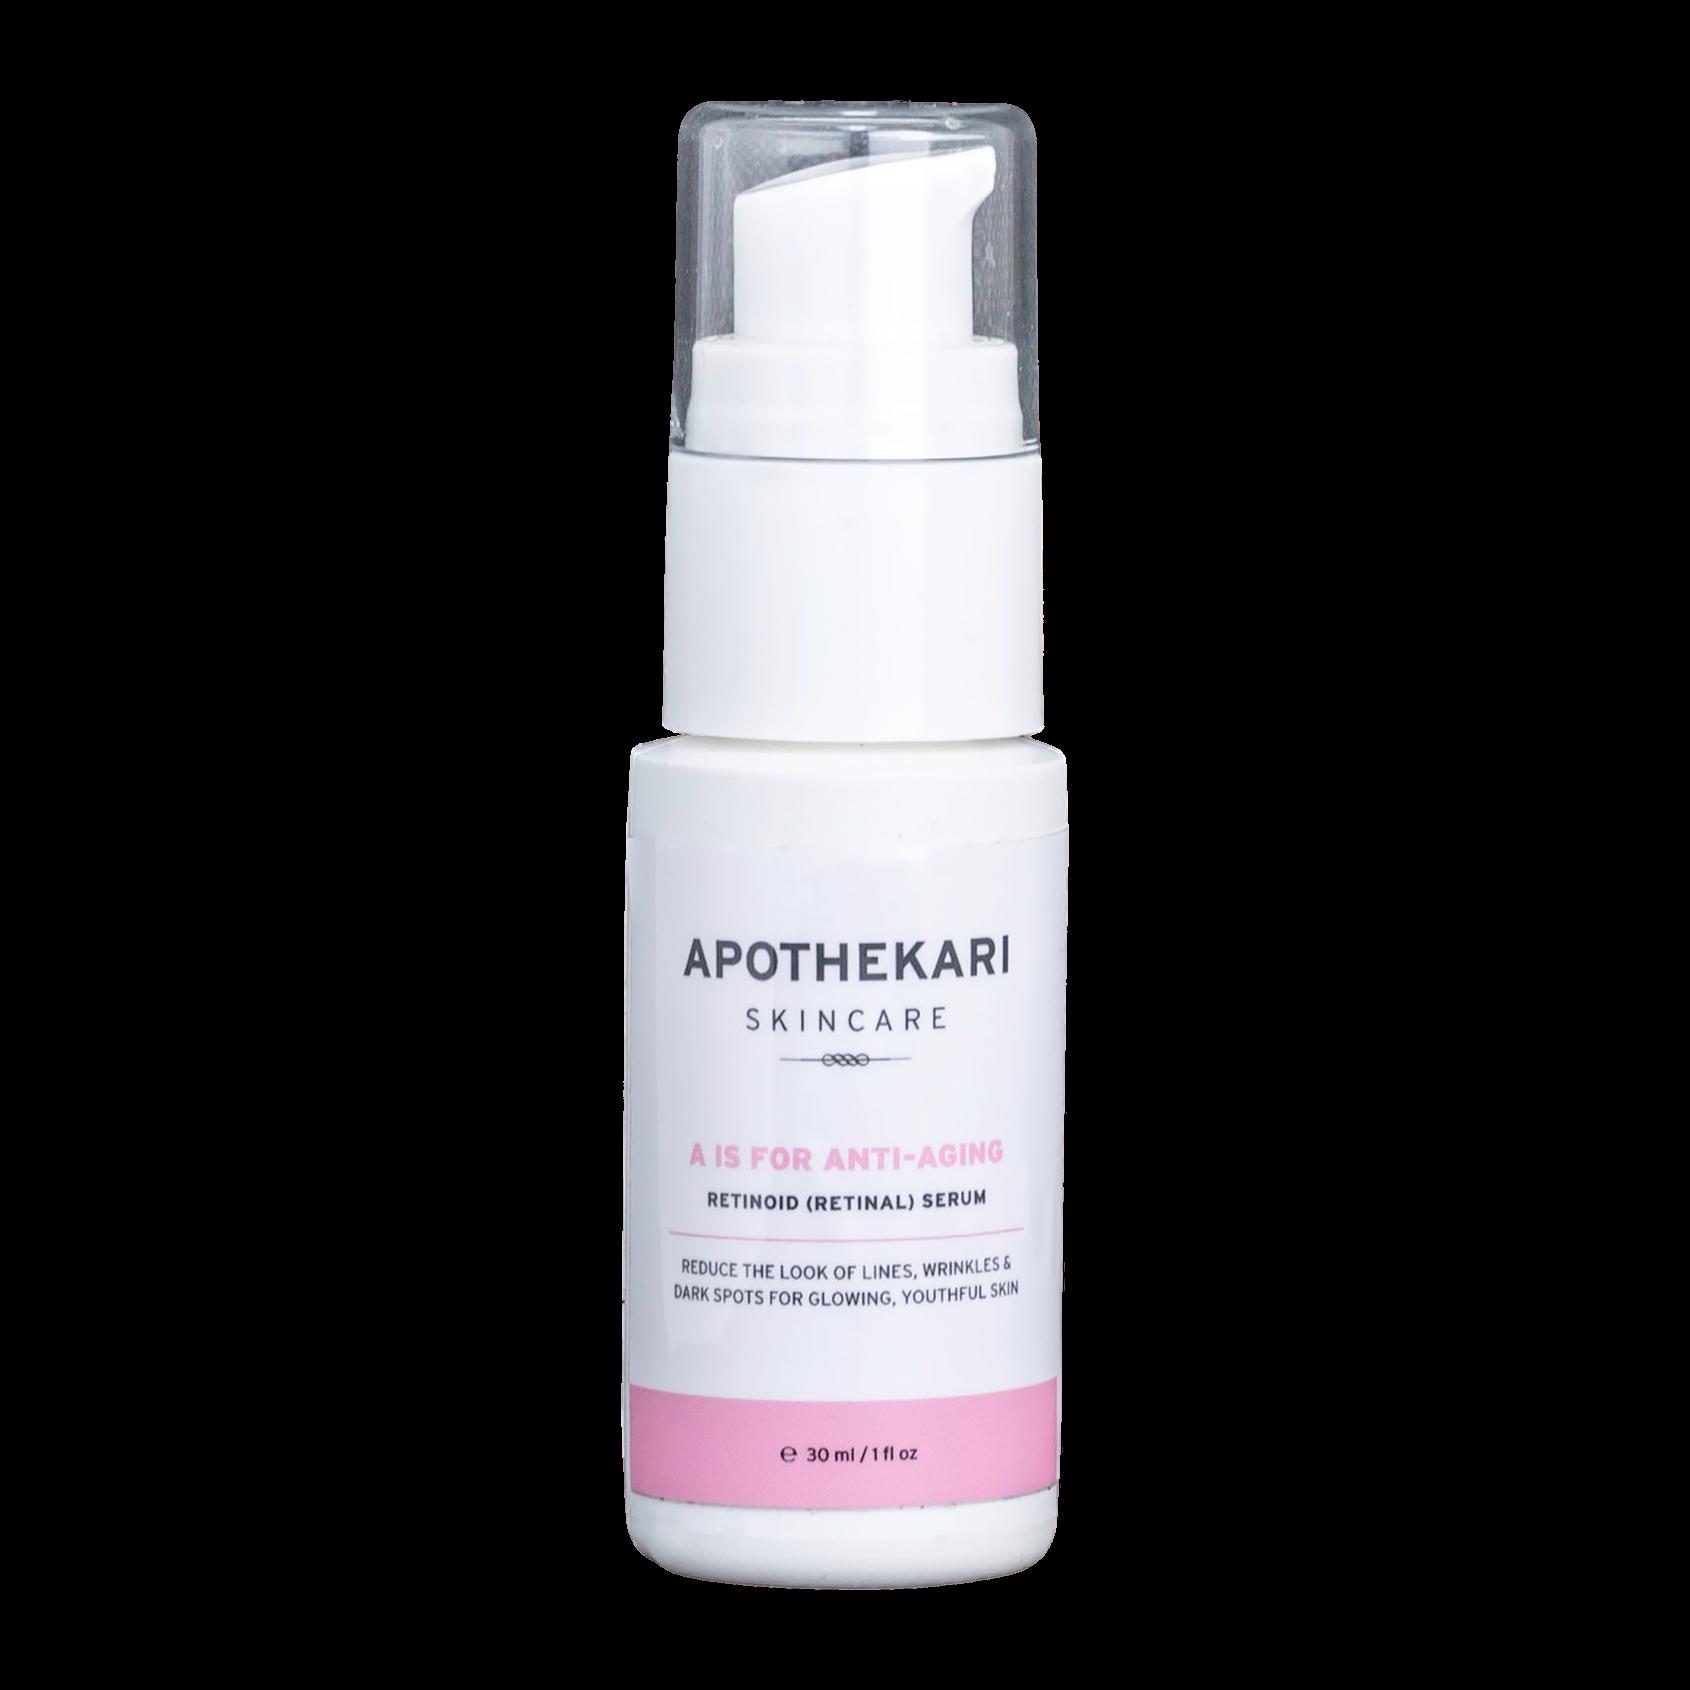 A-is-for-Anti-Aging-Retinal-Serum-Apothekari-Skincare